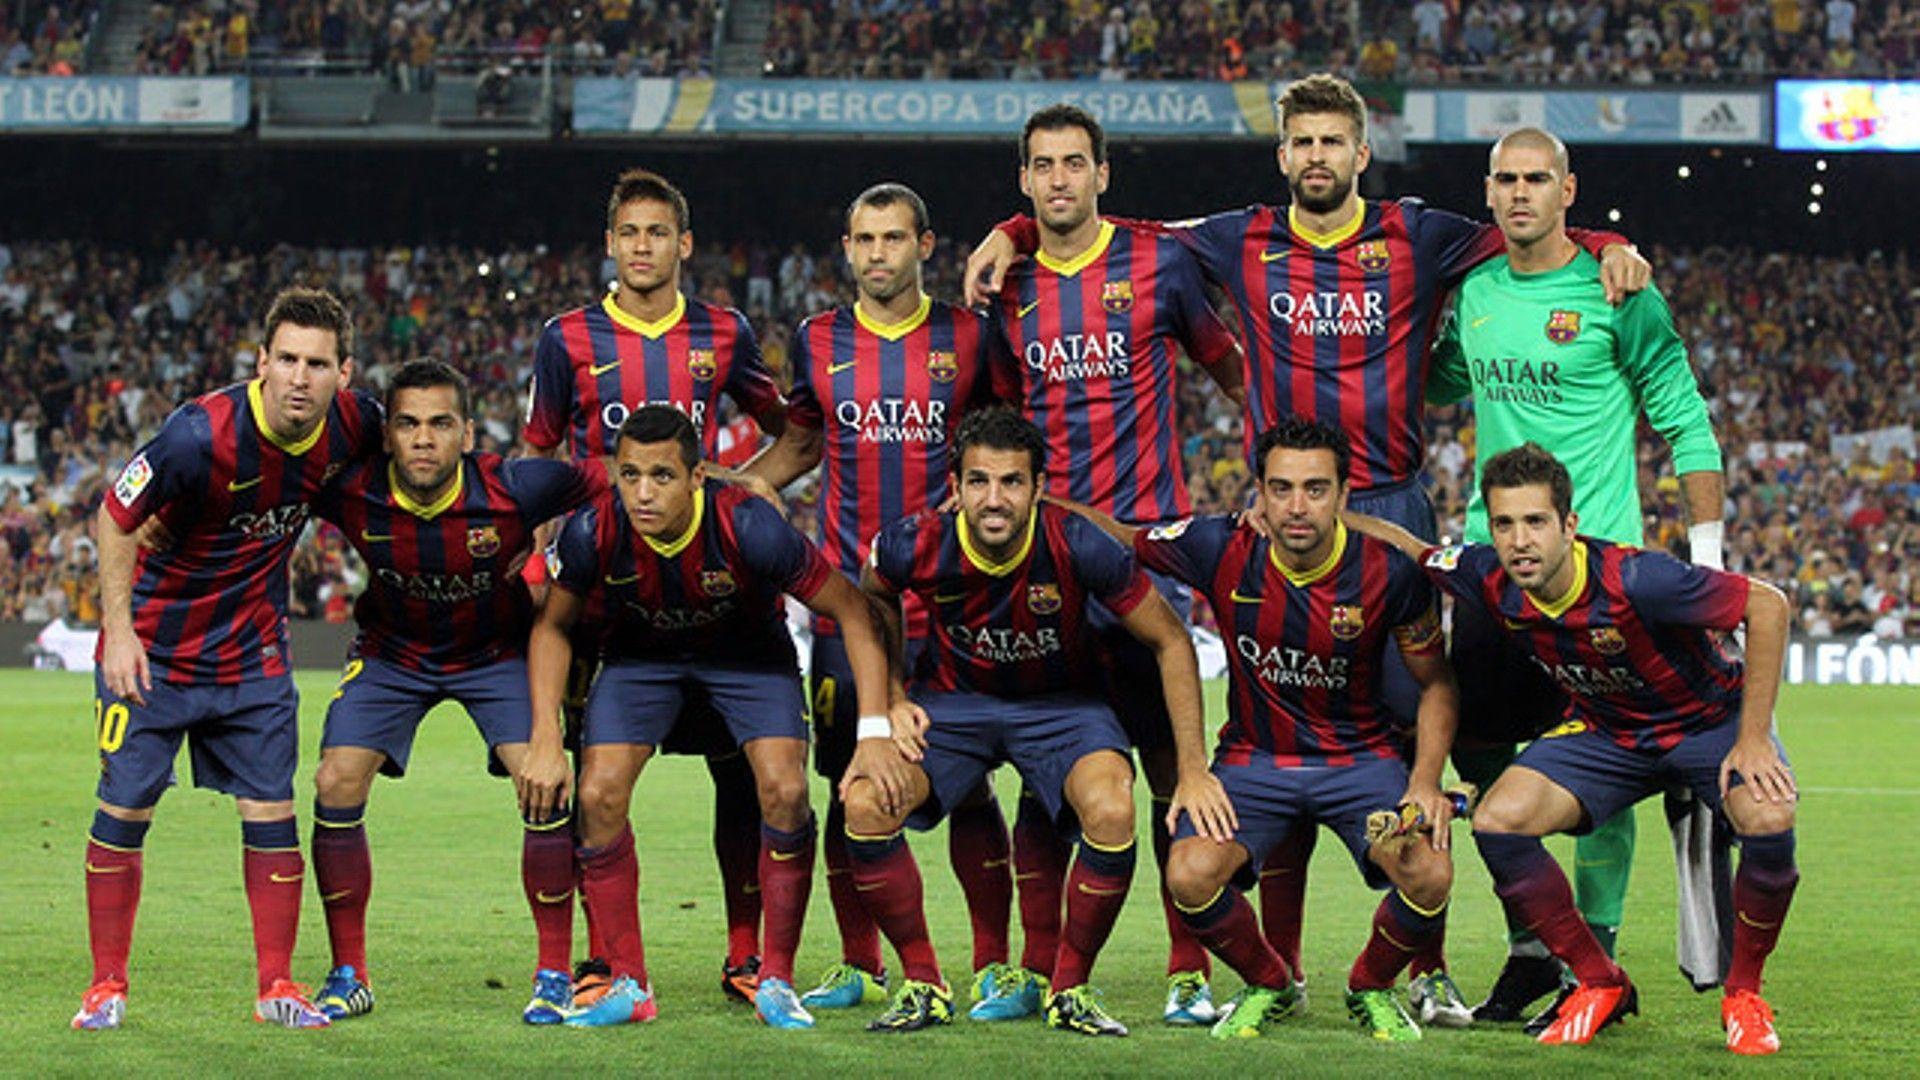 FC Barcelona National Football Team Background 7